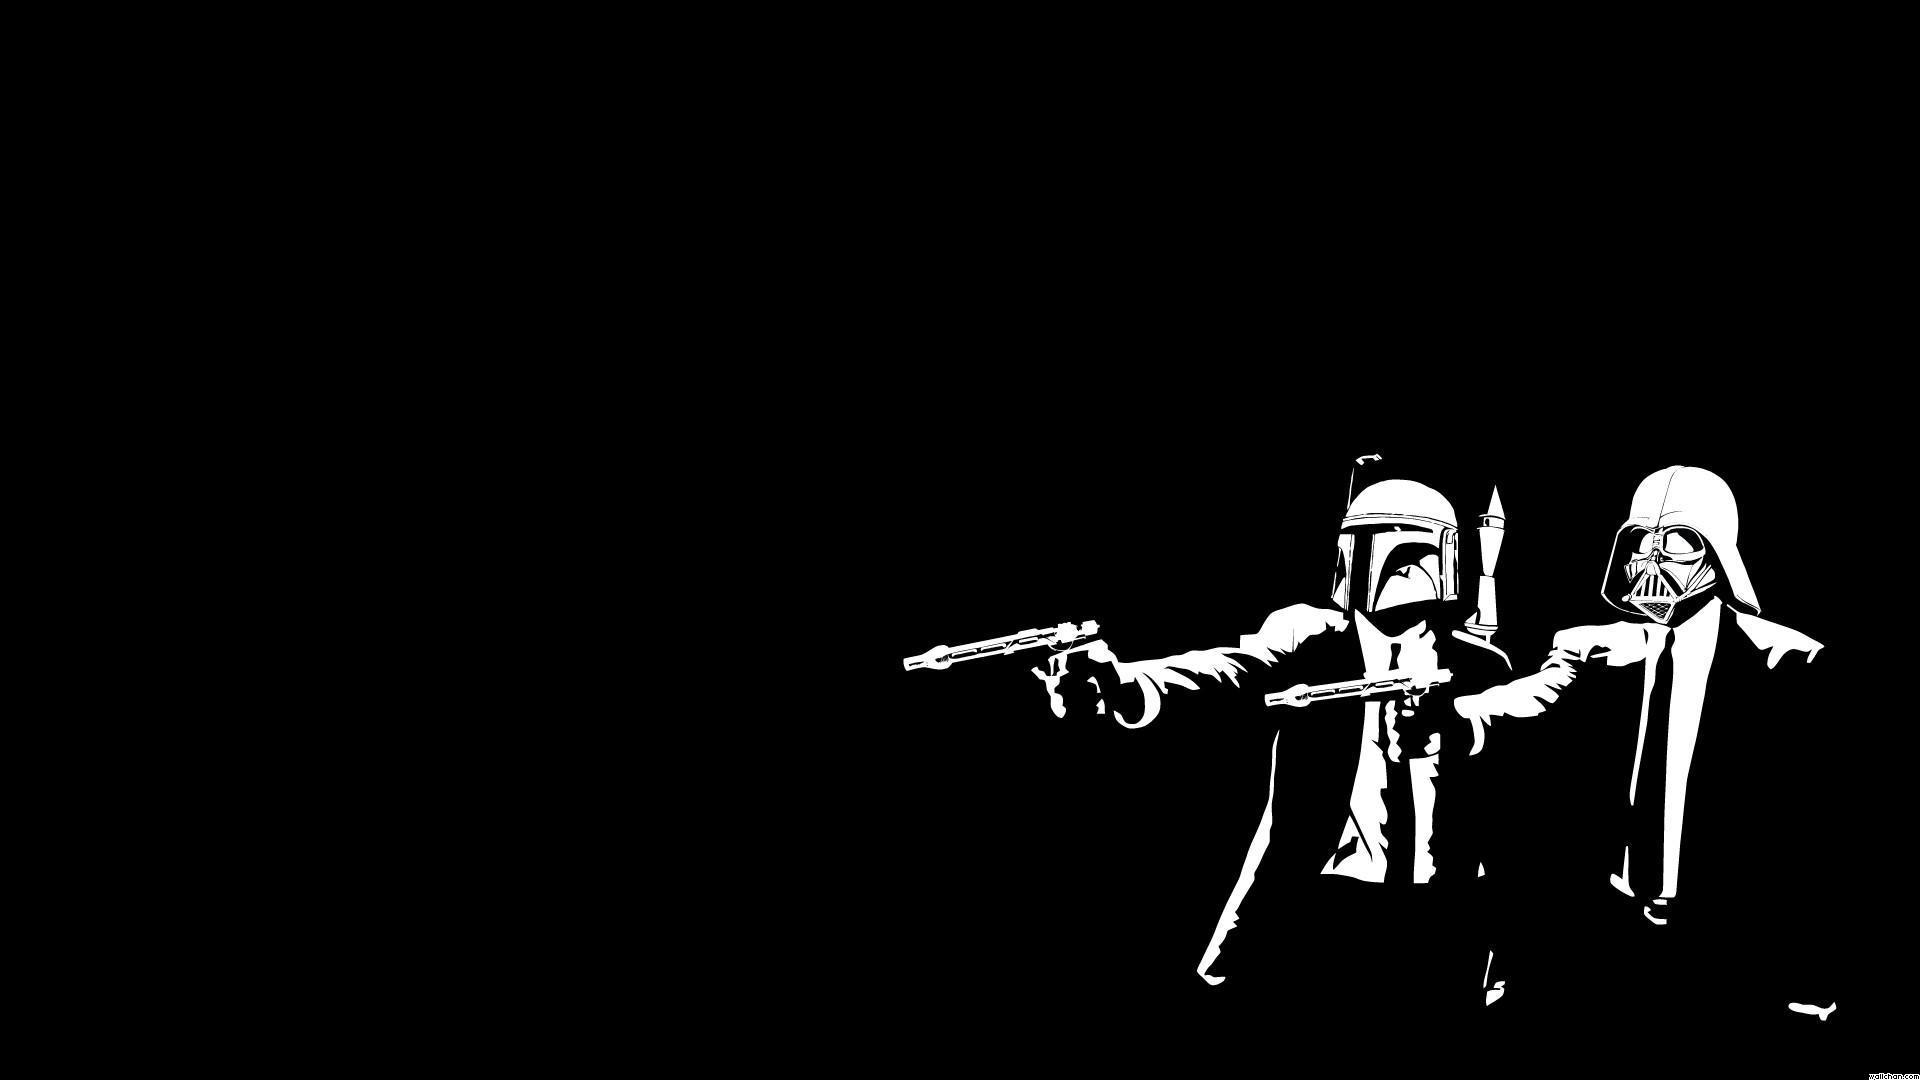 Triple Monitor Star Wars Wallpaper – WallpaperSafari | Epic Car Wallpapers  | Pinterest | Star wars wallpaper and Wallpaper